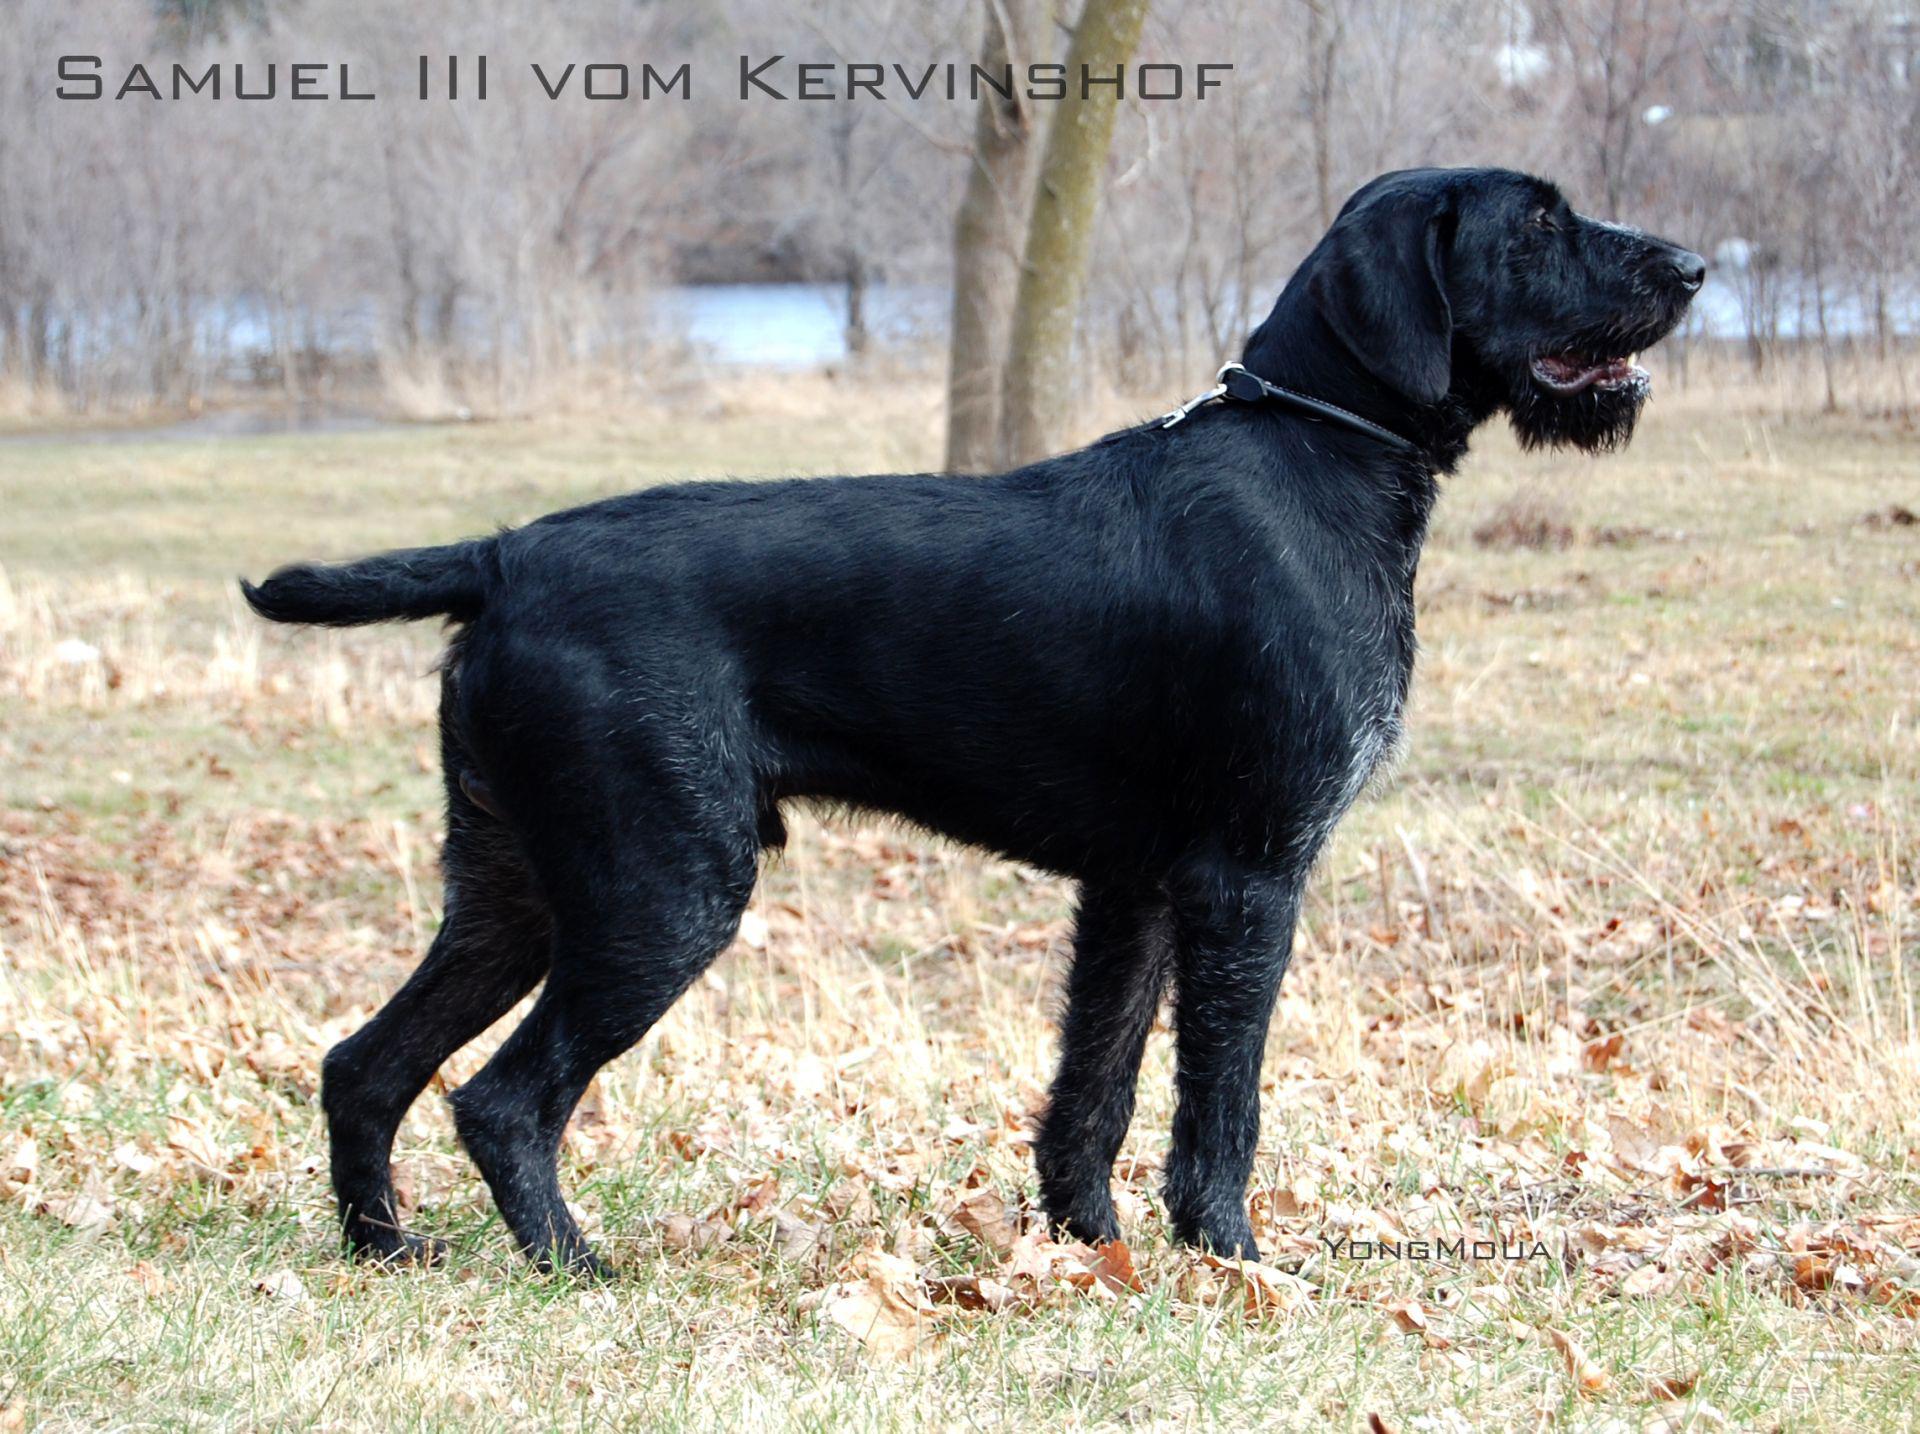 Samuel III vom Kervinshof_03172012_resized.jpg